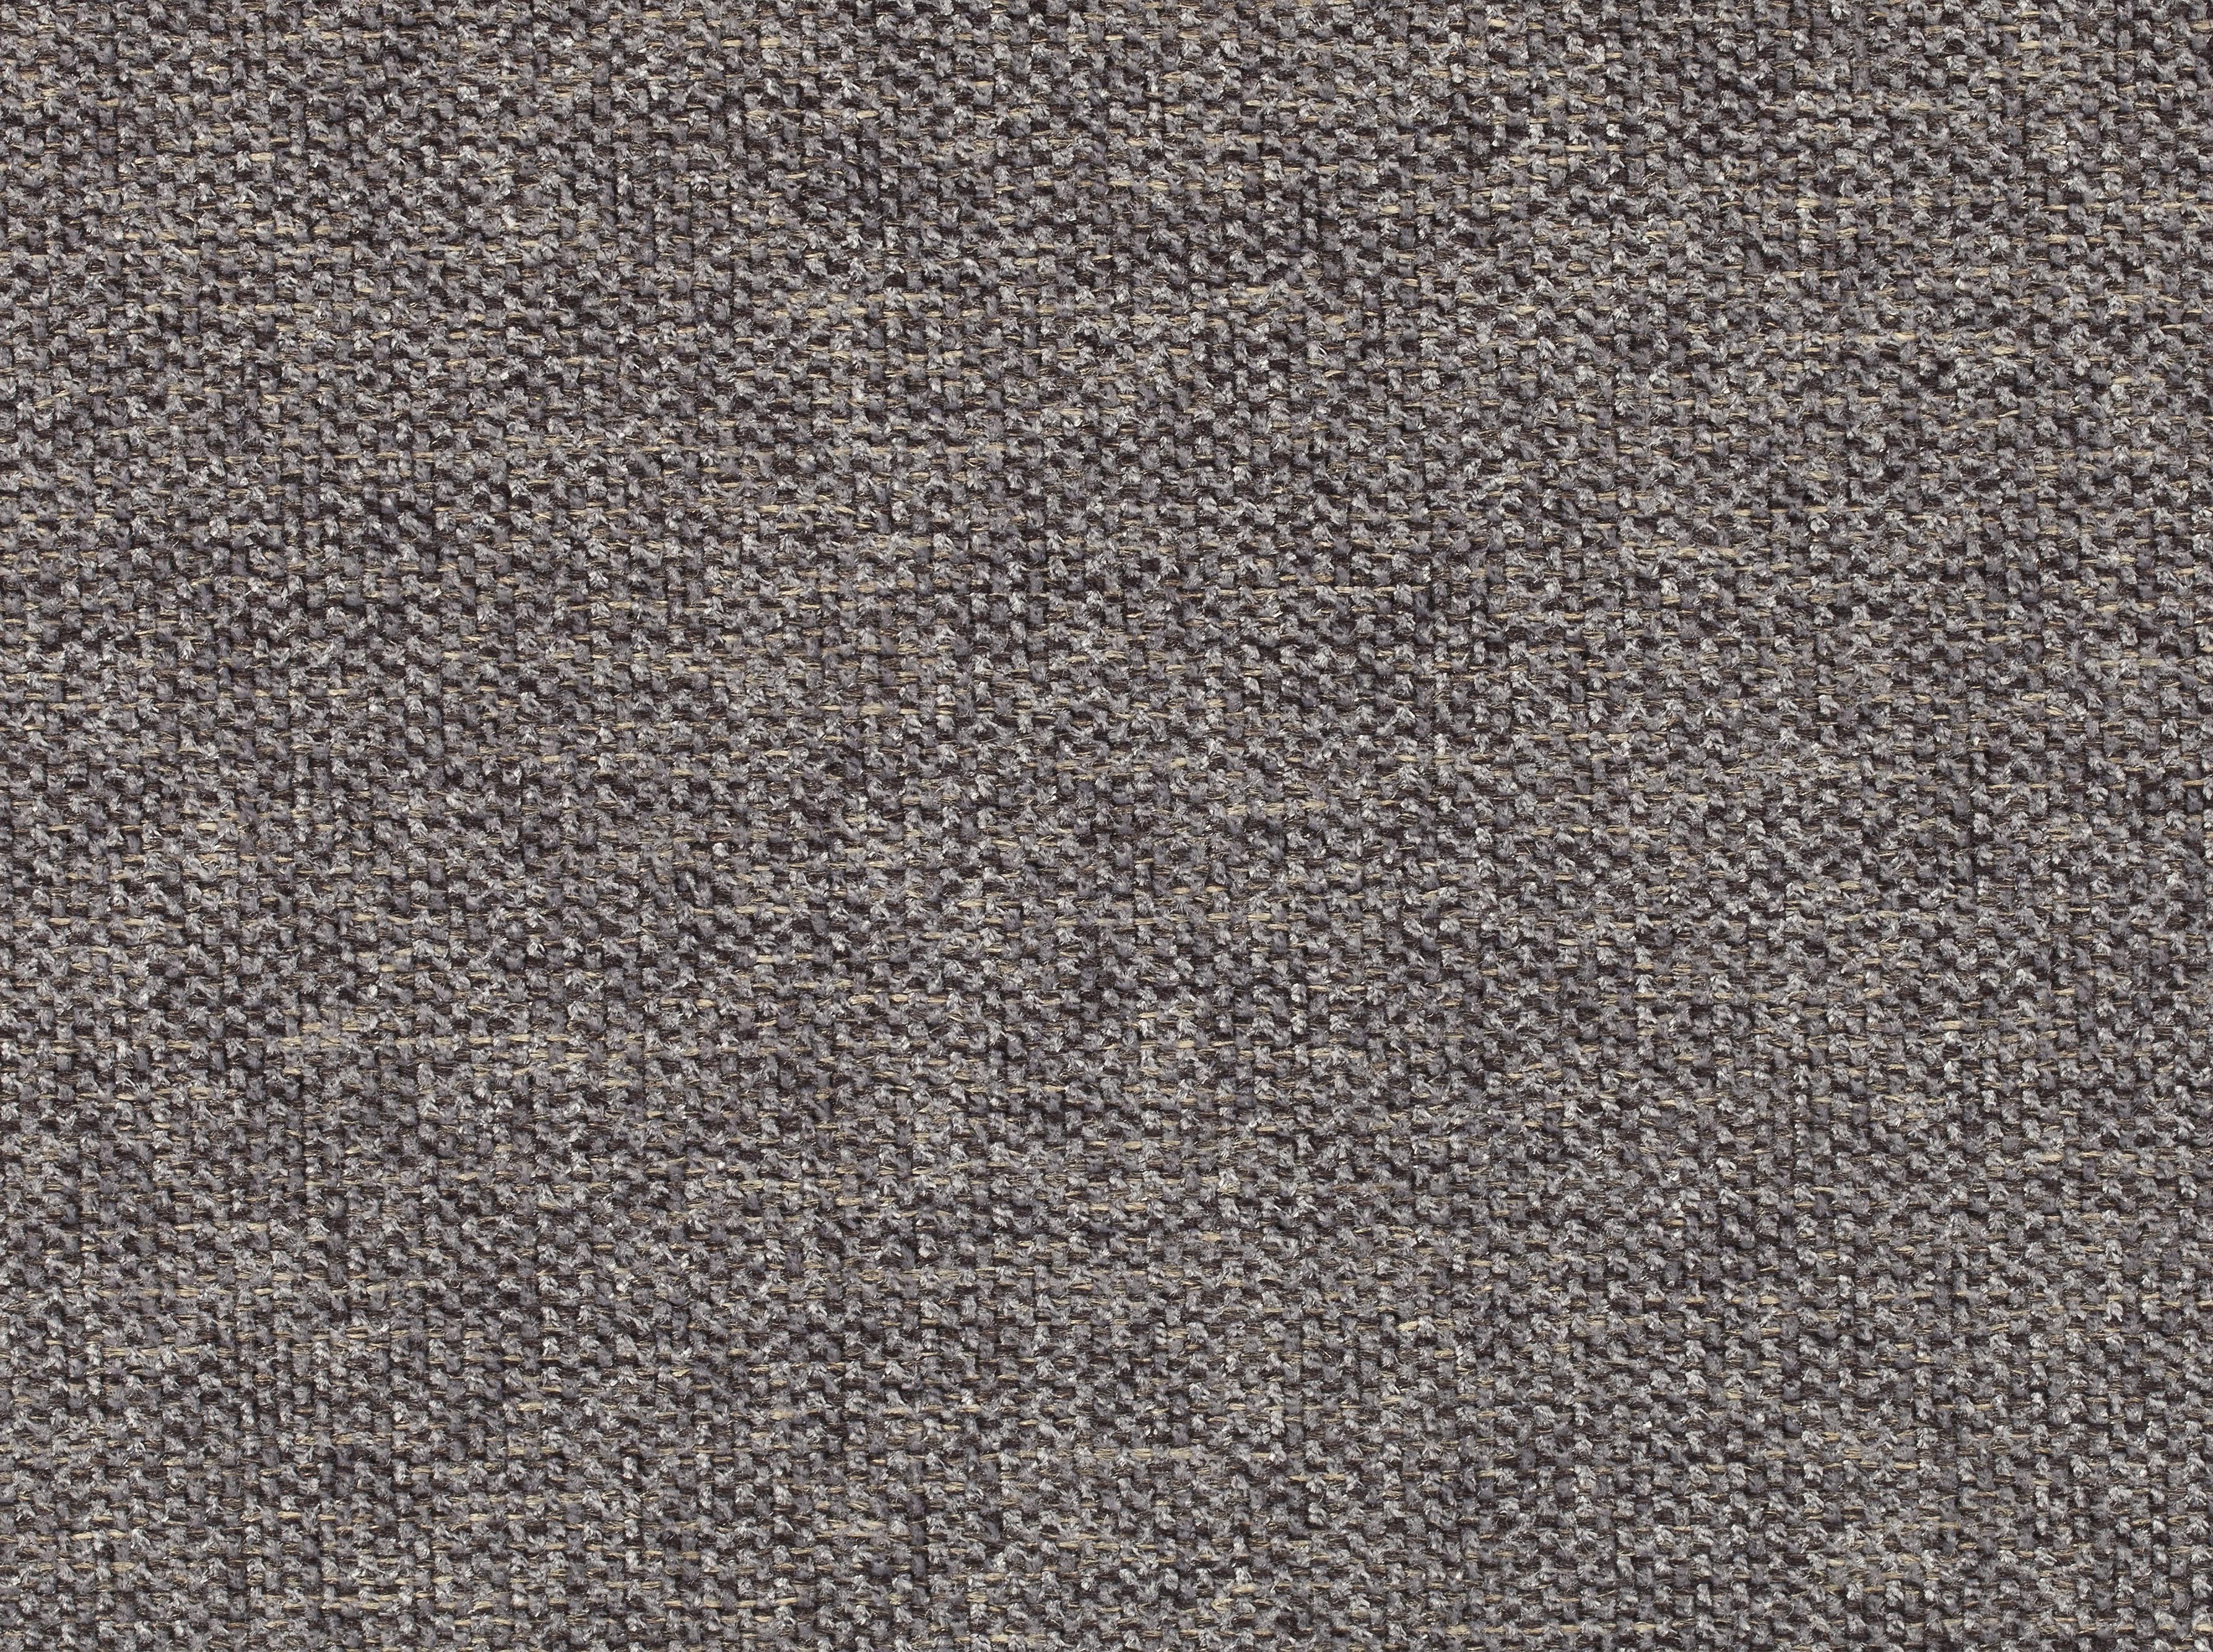 C1 4177 Gray